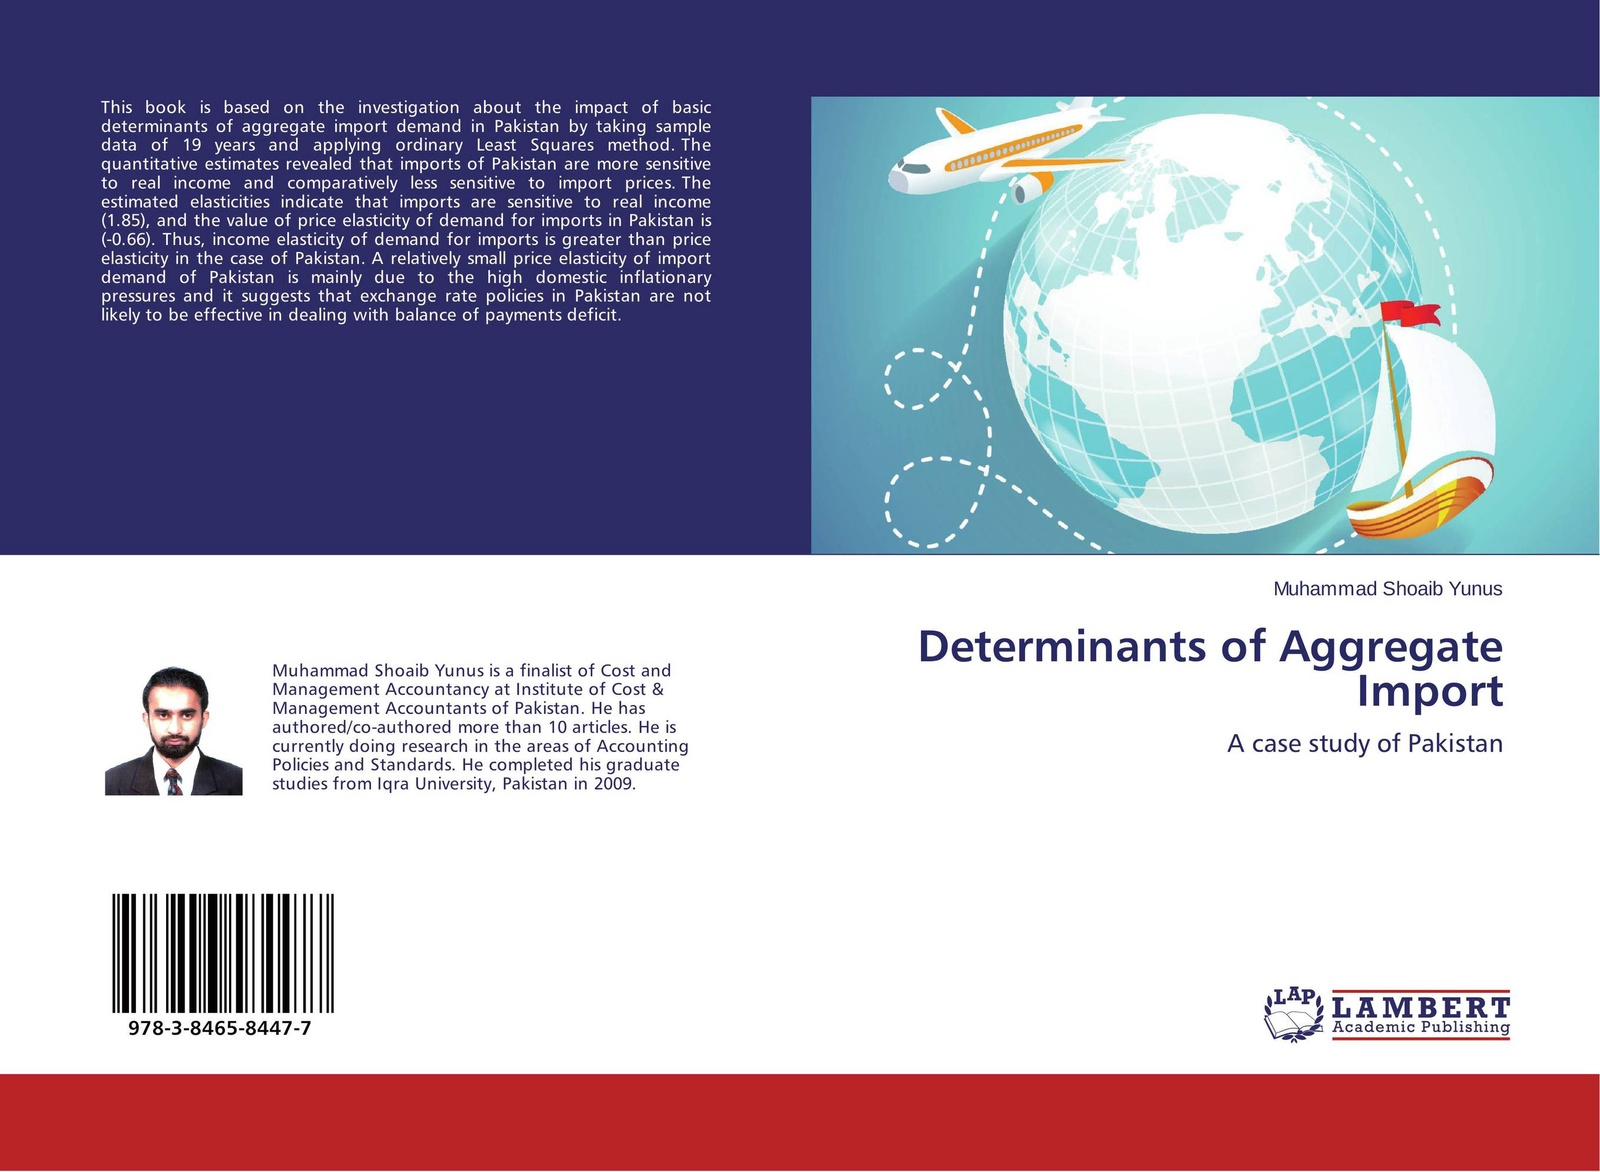 Muhammad Shoaib Yunus Determinants of Aggregate Import muhammad altaf qureshi universalization of primary education in pakistan